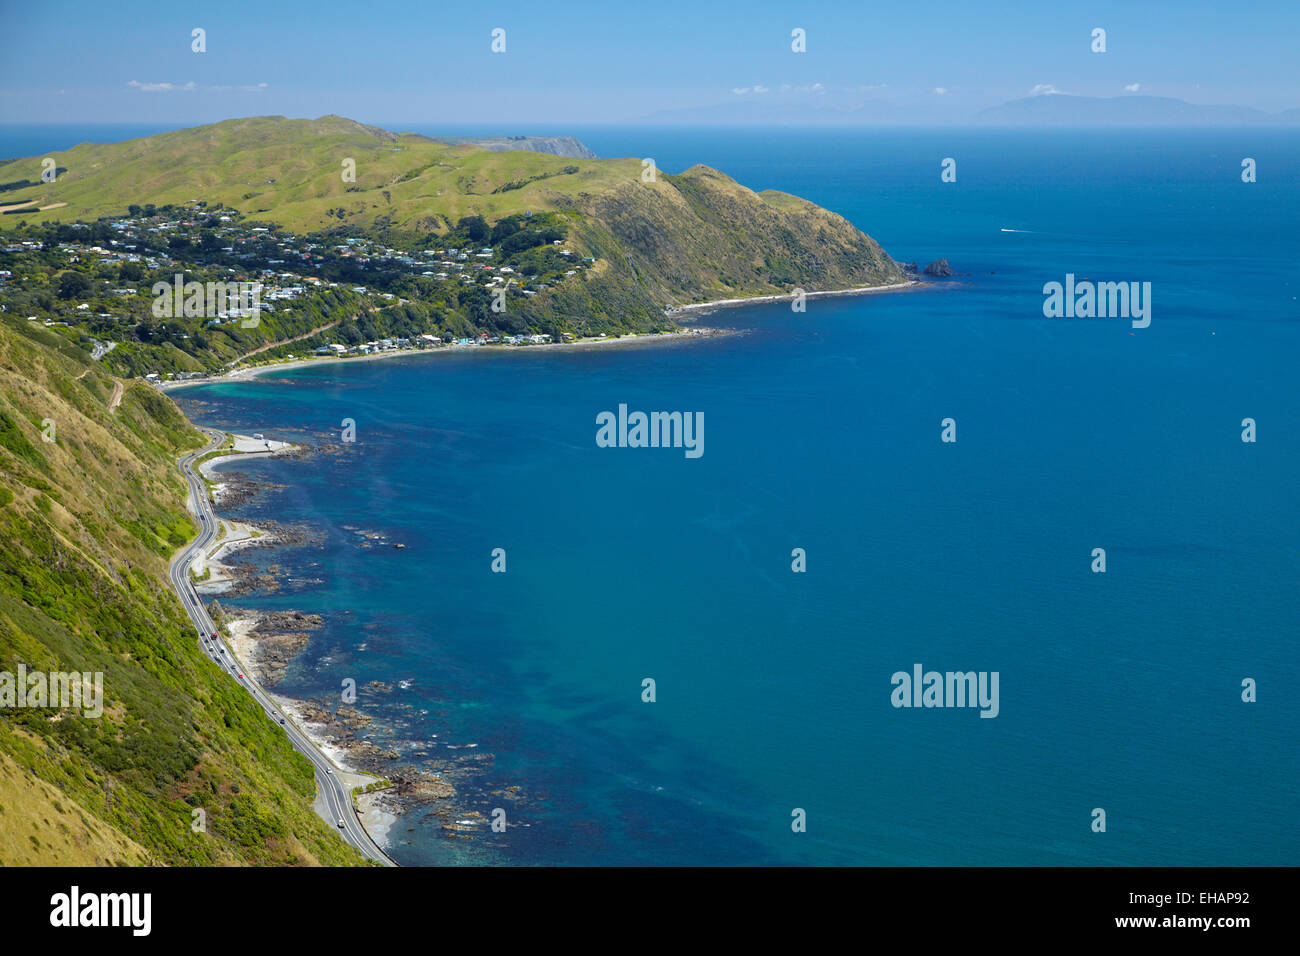 State Highway One, Pukerua Bay, Wellington region, North Island, New Zealand - aerial - Stock Image